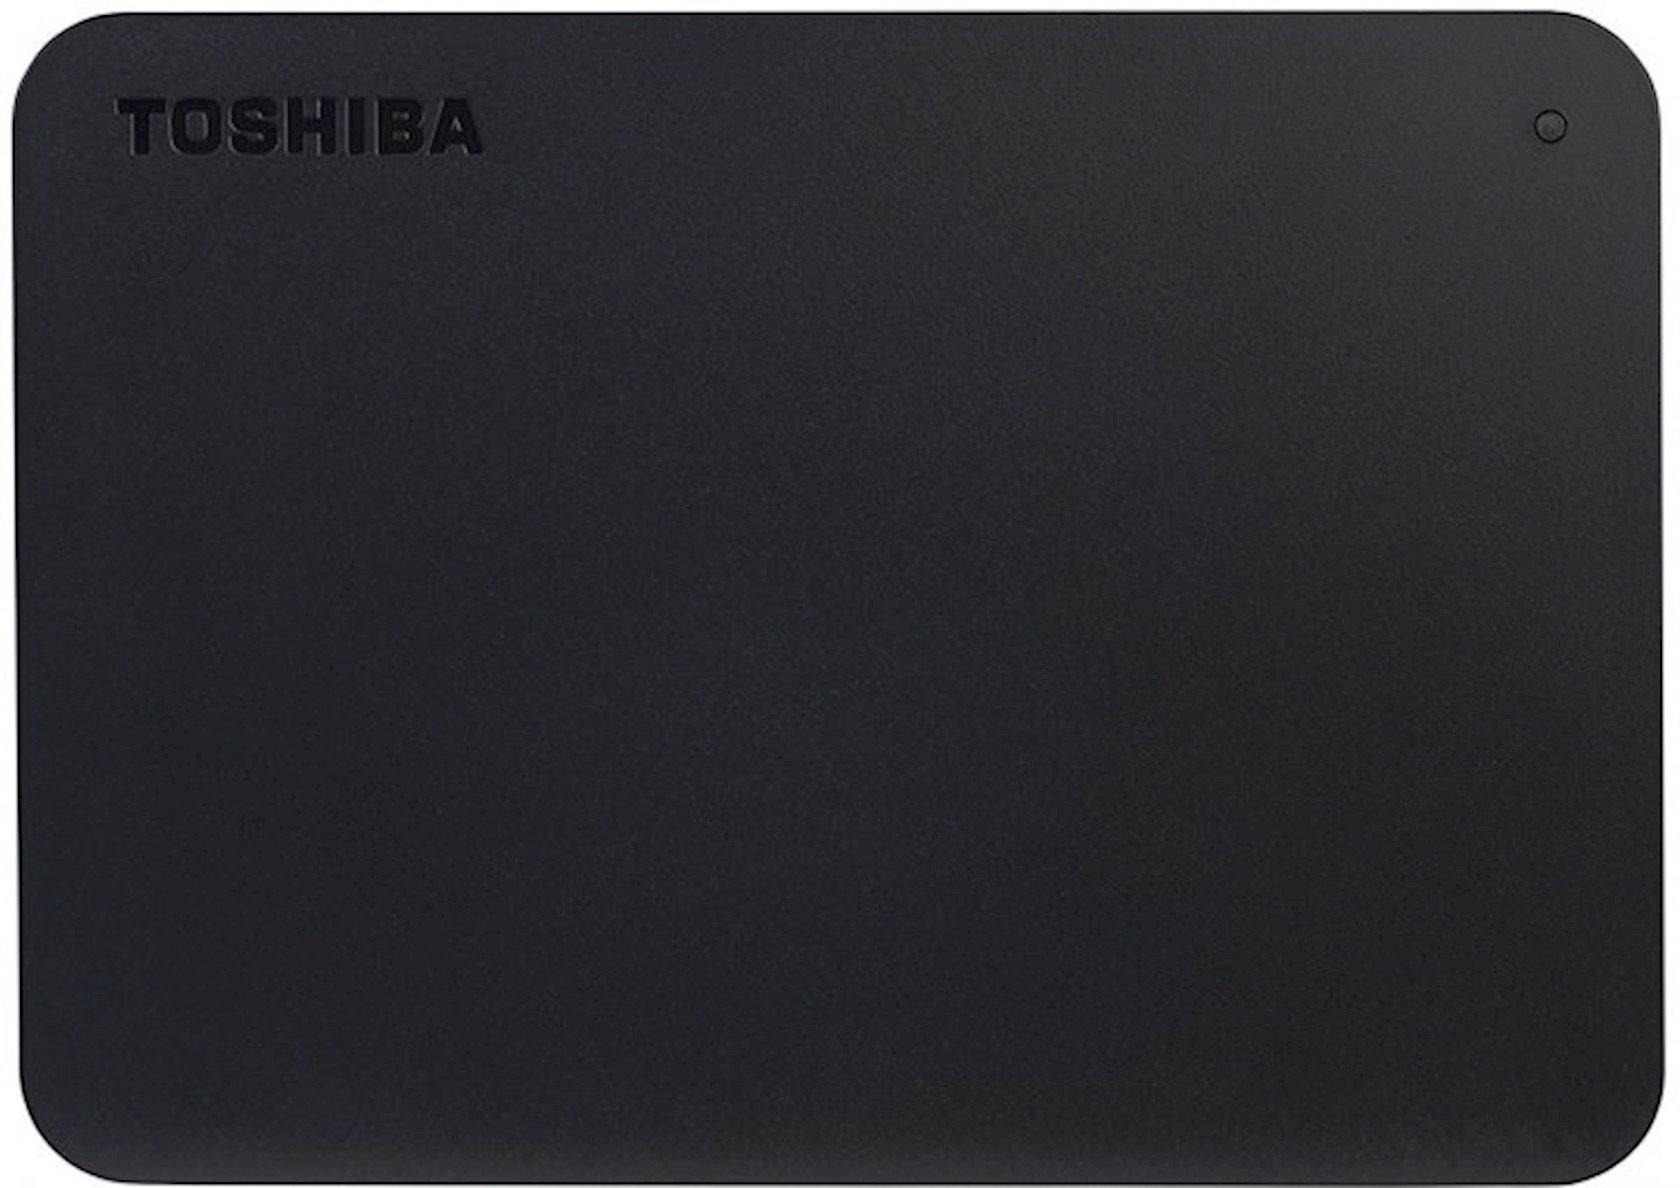 Xarici sərt disk Toshiba HDD Canvio Basics 1T (HDTB410EK3AA)